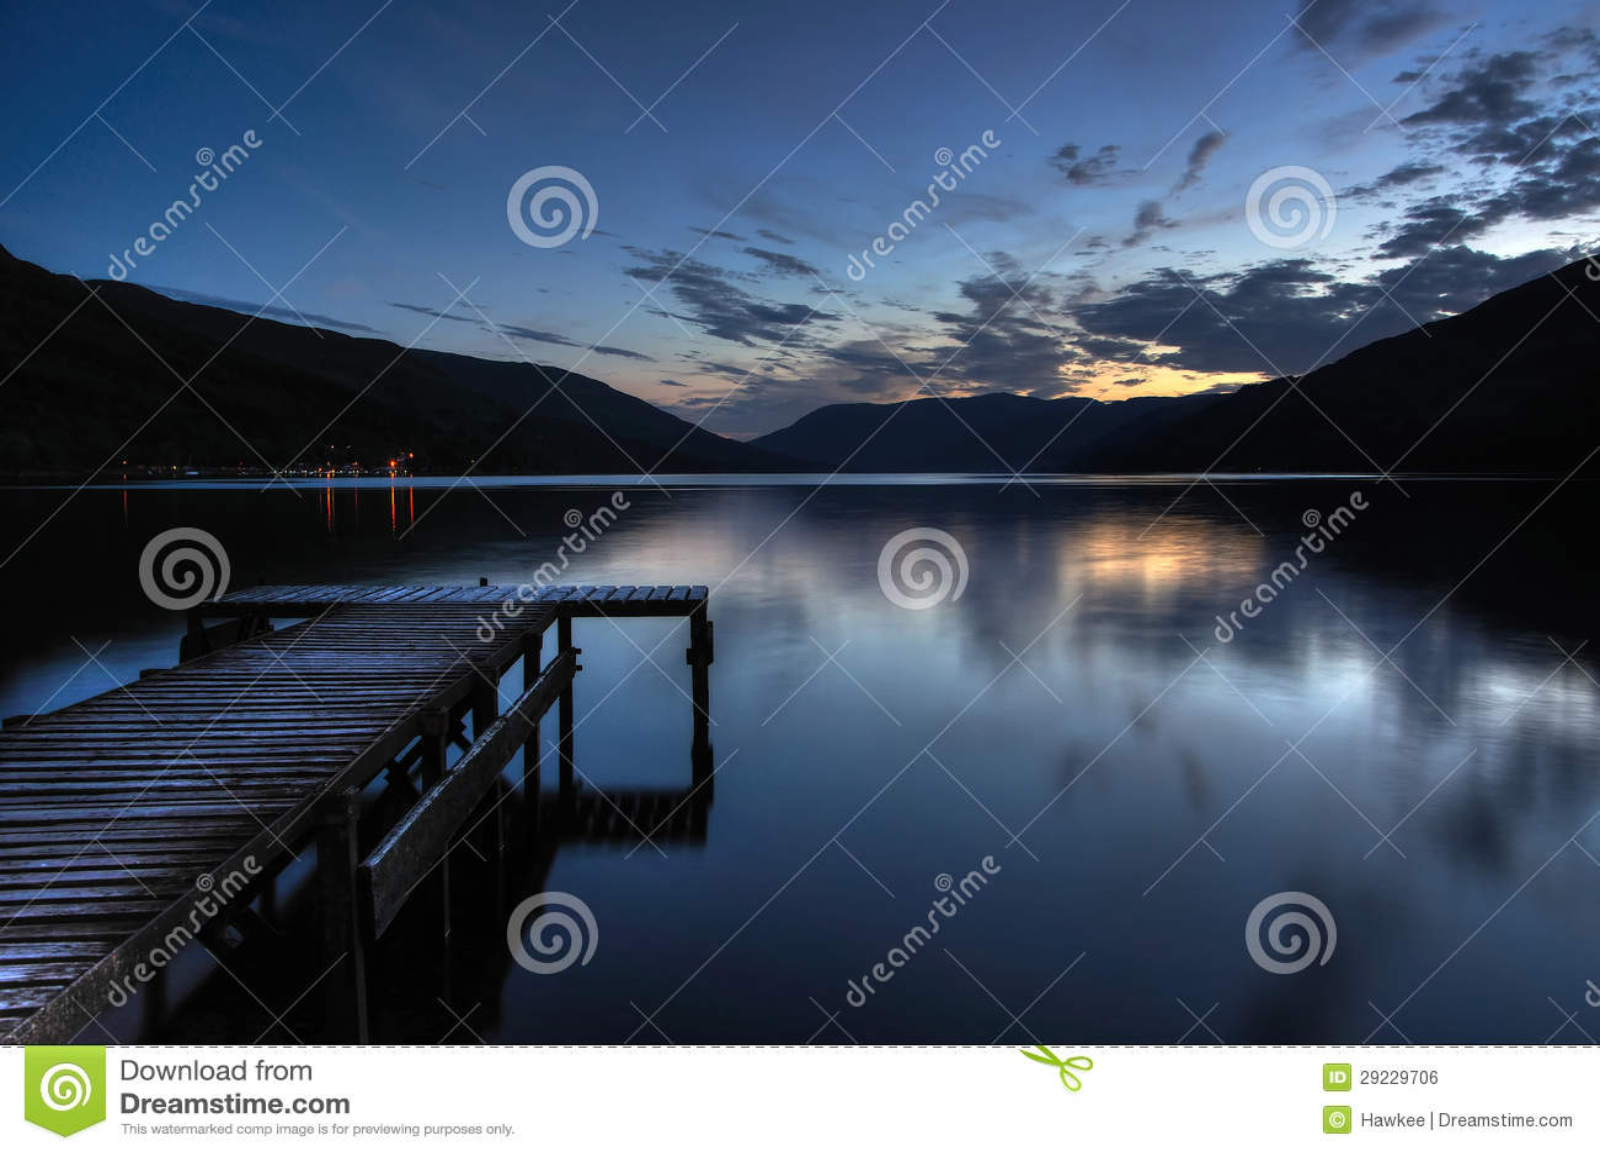 Scottish Loch Trossachs Royalty-Free Stock Photo | CartoonDealer.com ...